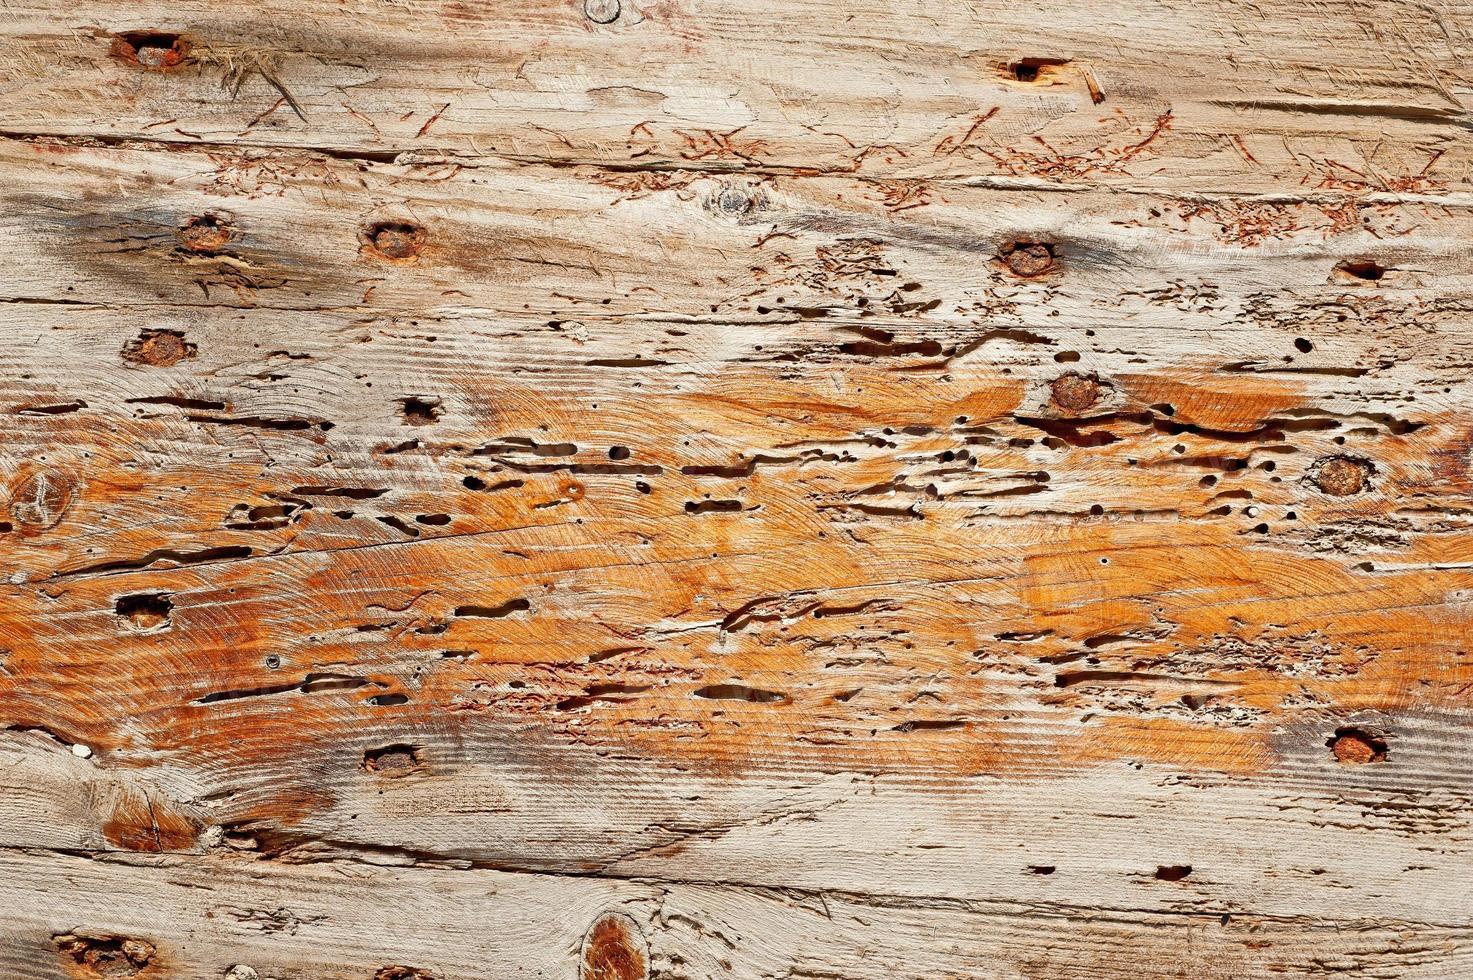 anobium thomsoni danni su legno foto